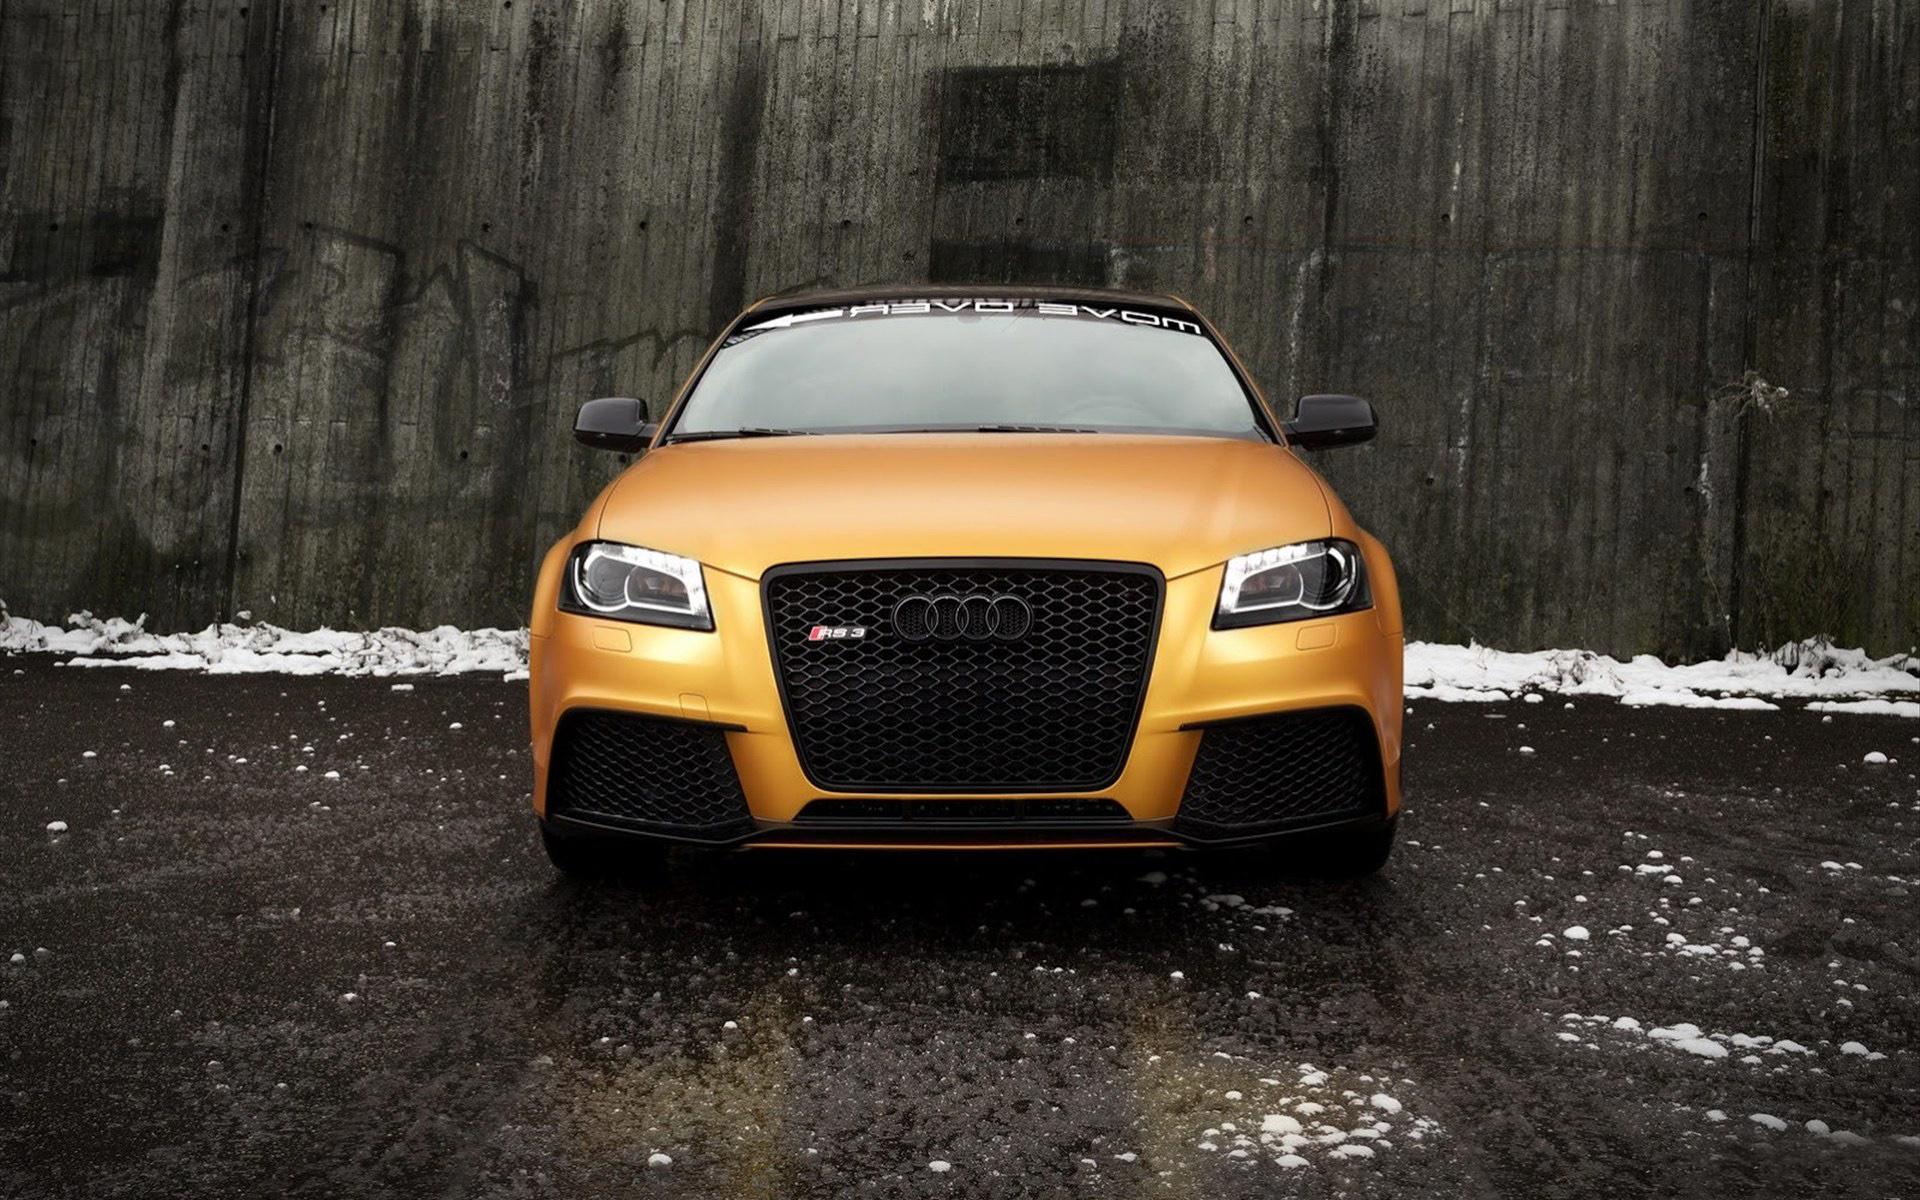 2013 Audi Rs3 Sportback By Schwabenfolia Wallpaper Hd Car Wallpapers Id 3330